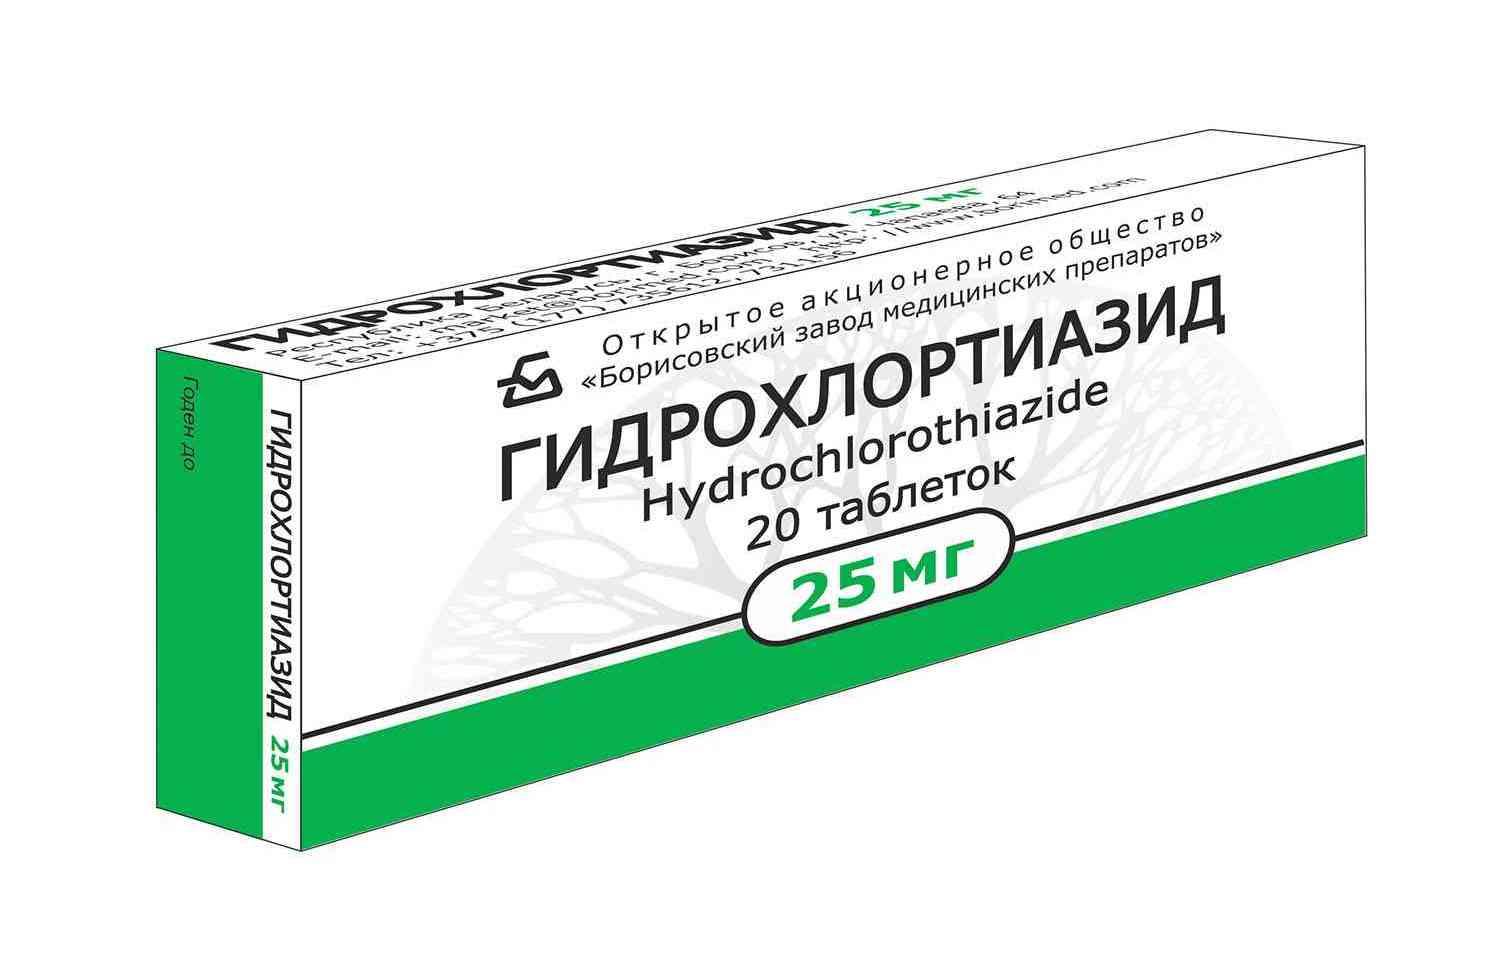 tirotoxikózis hipertónia)